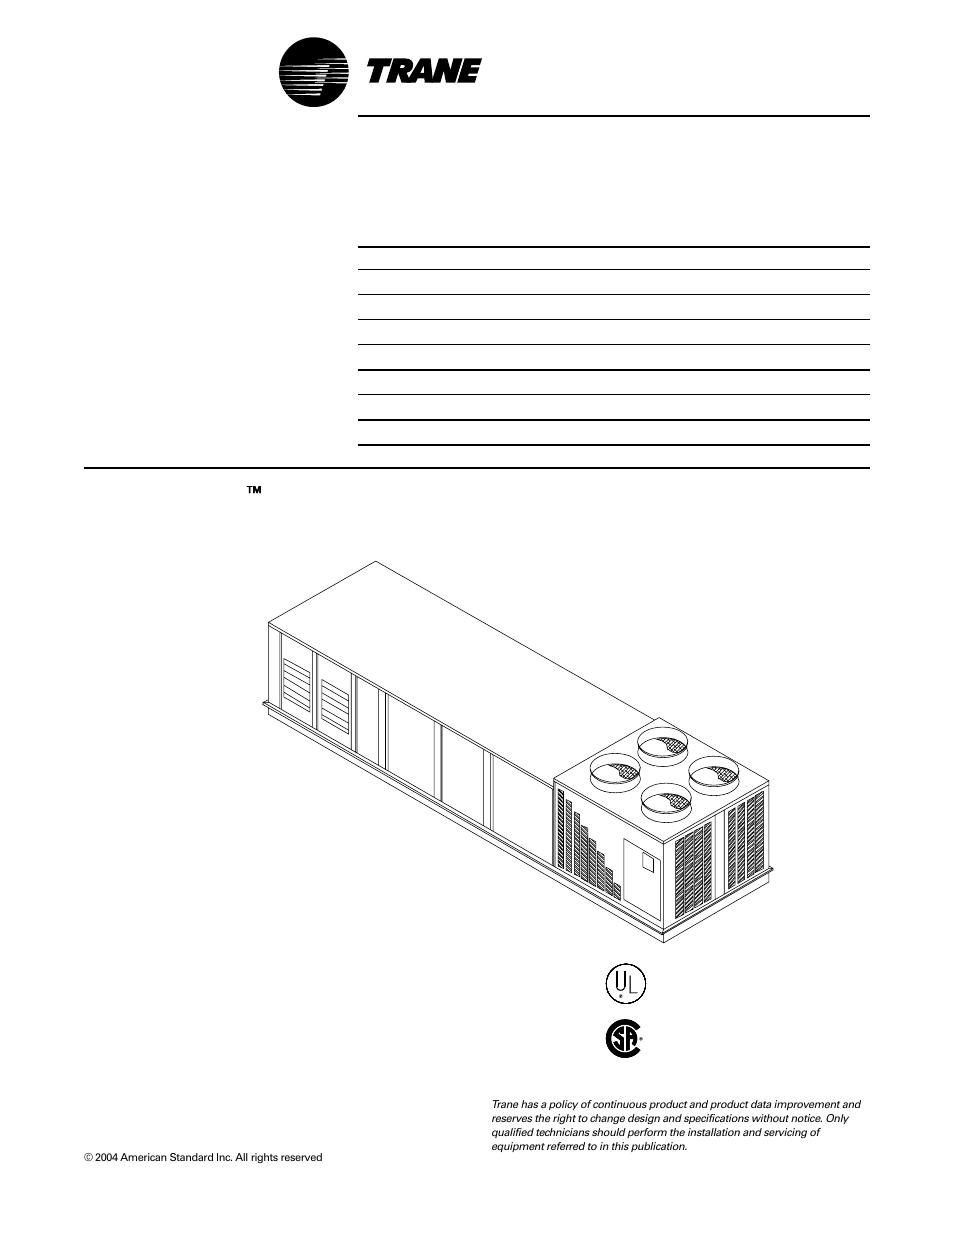 trane intellipak  u2122  u2122  u2122  u2122  u2122 commercial single